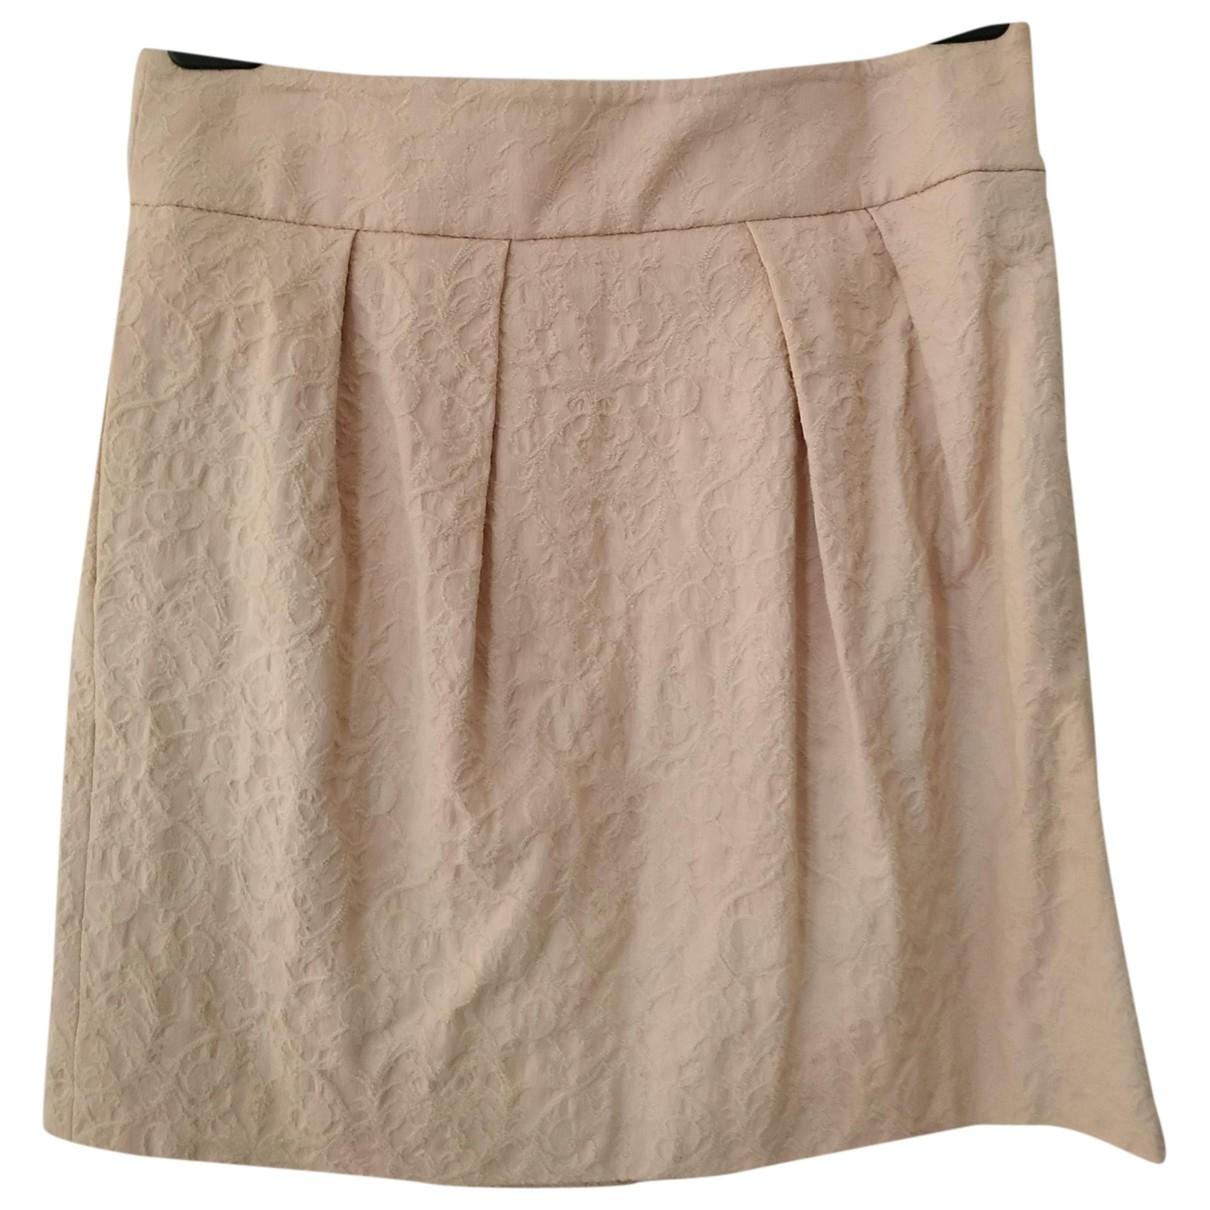 Zara \N Beige Cotton skirt for Women S International